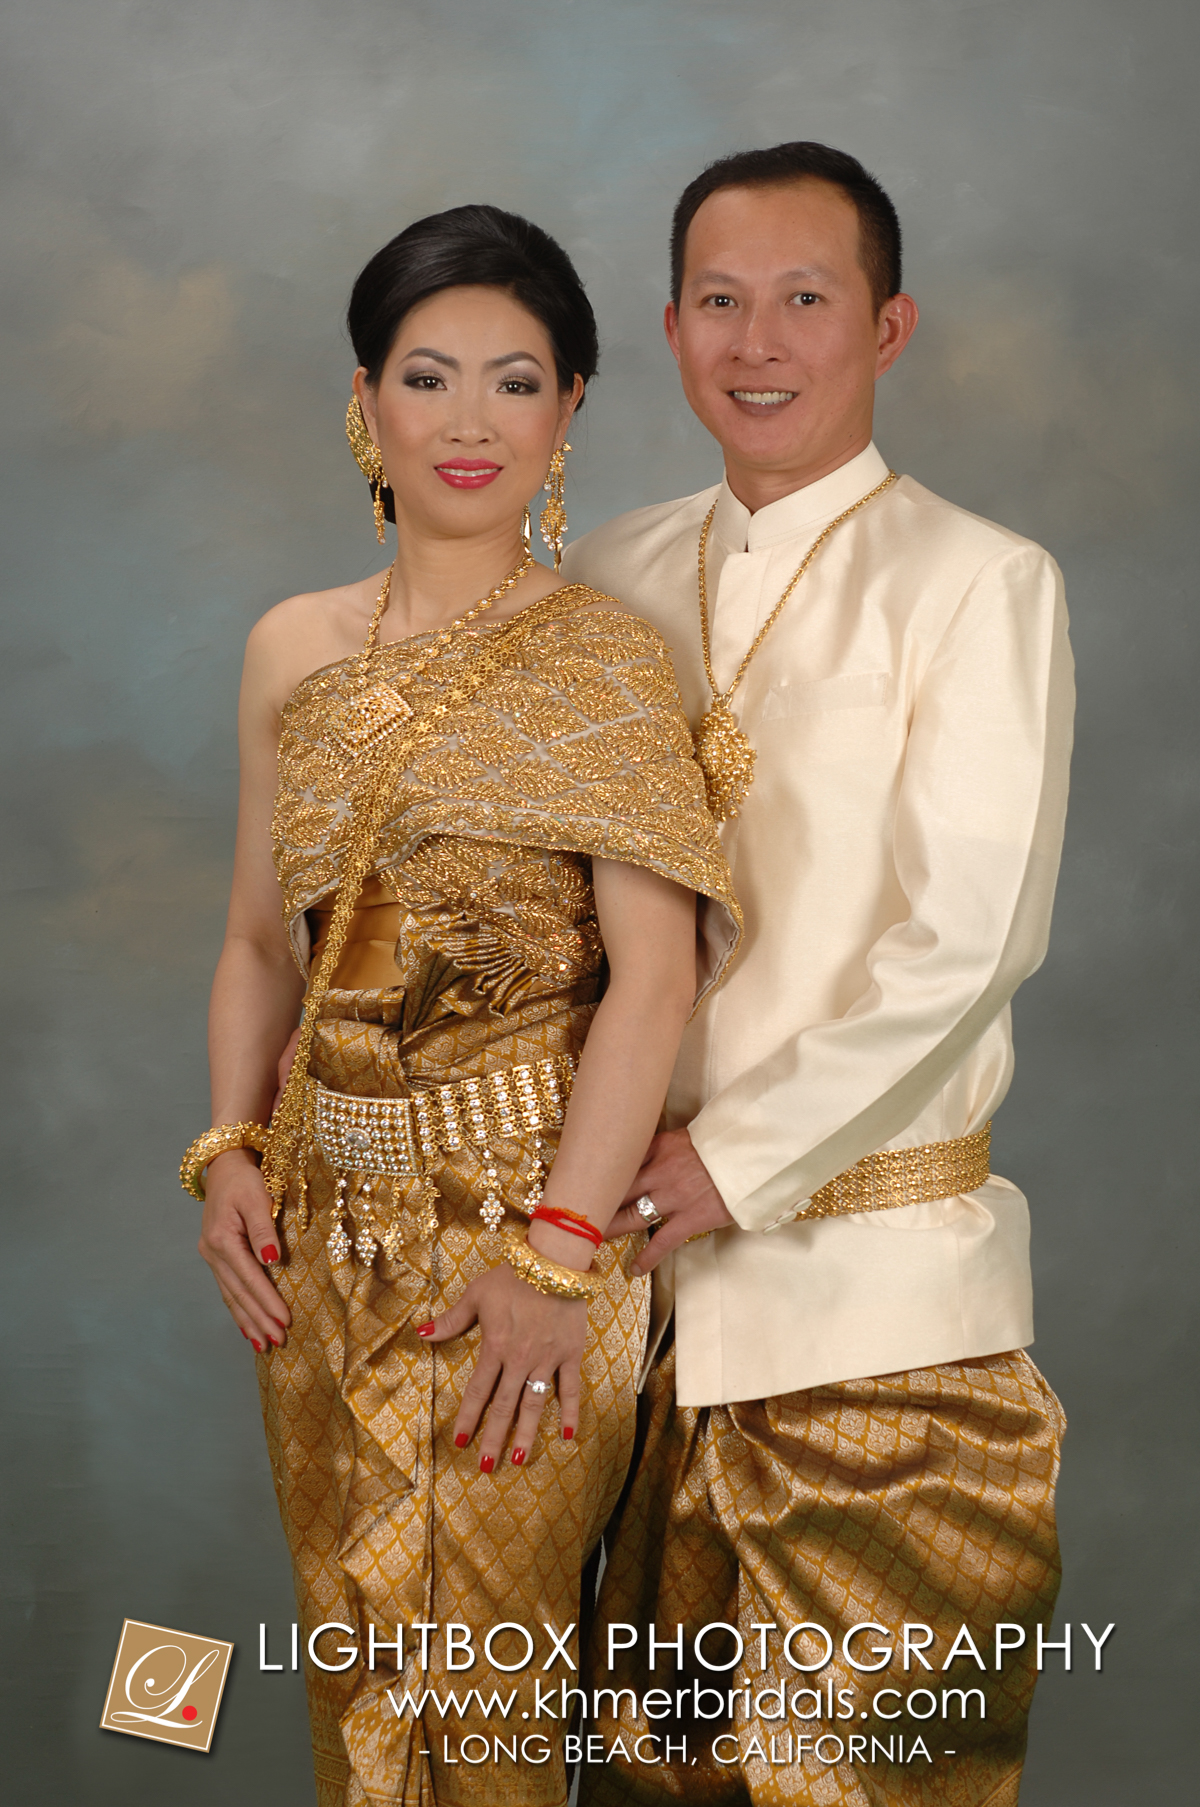 Apsara Khmer Bridal Wedding Photography and video-216.jpg